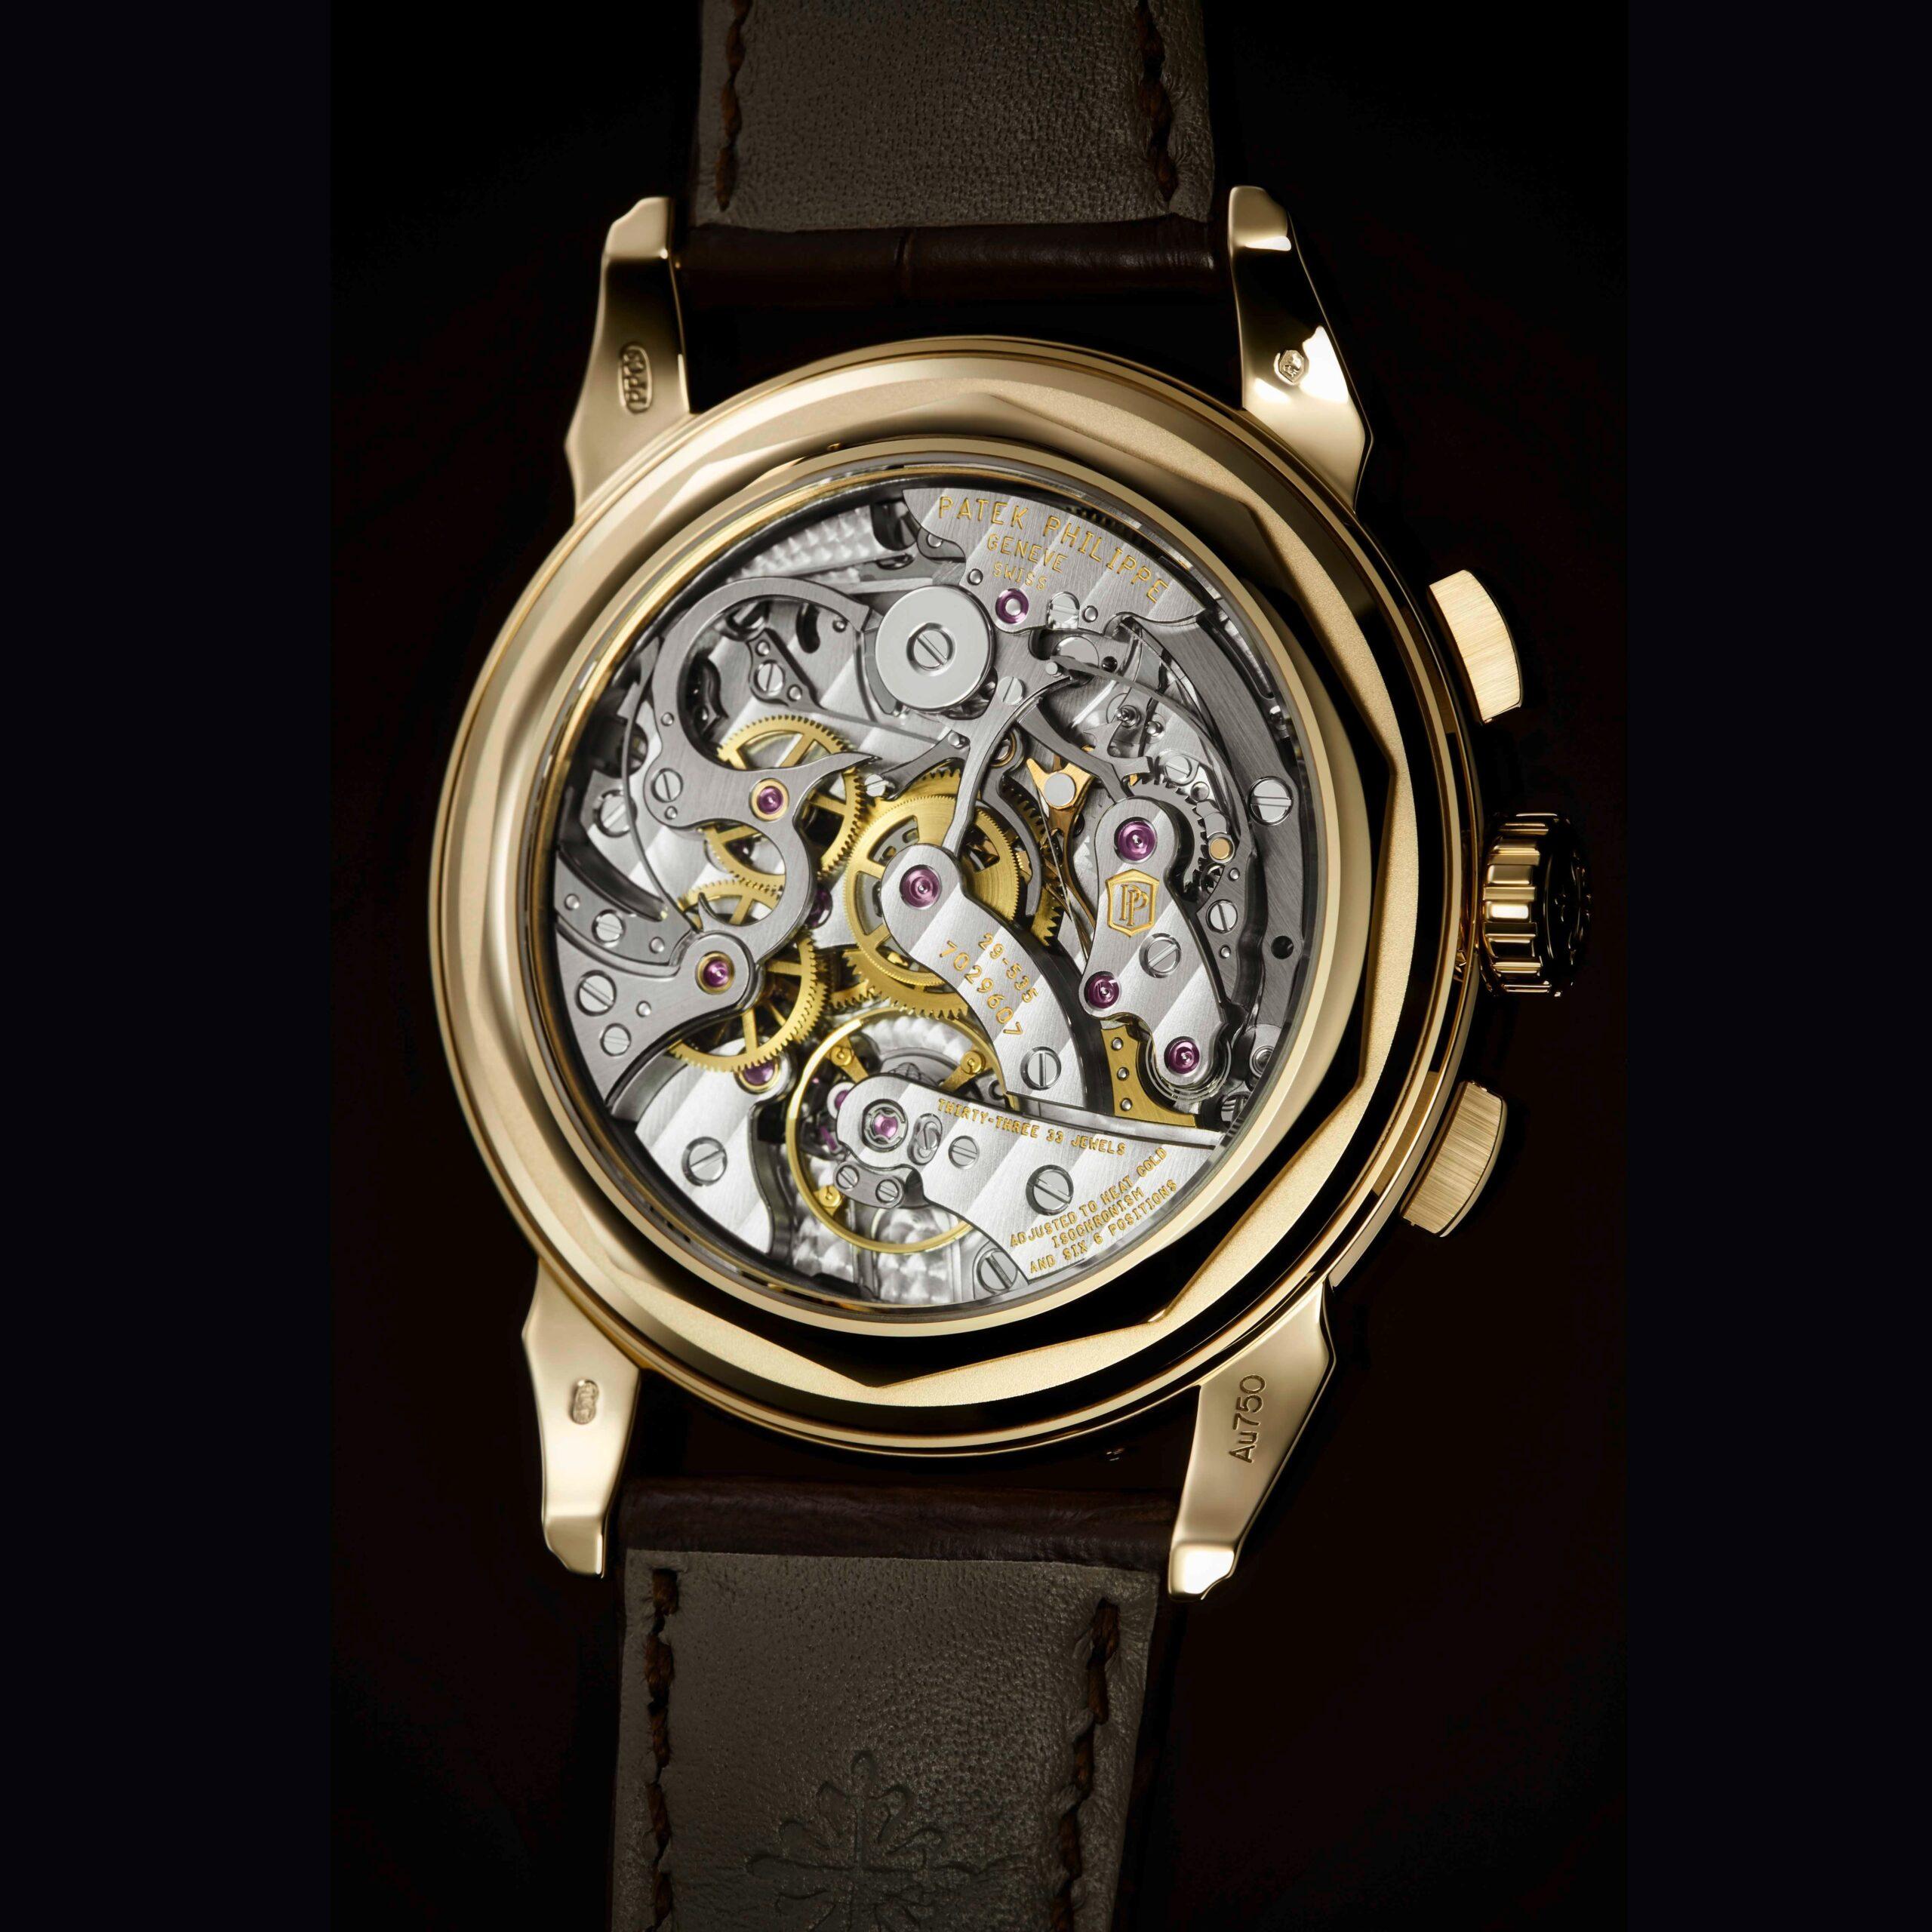 Patek Philippe Perpetual Calendar Chronograph Ref 5270J-001 -fondo